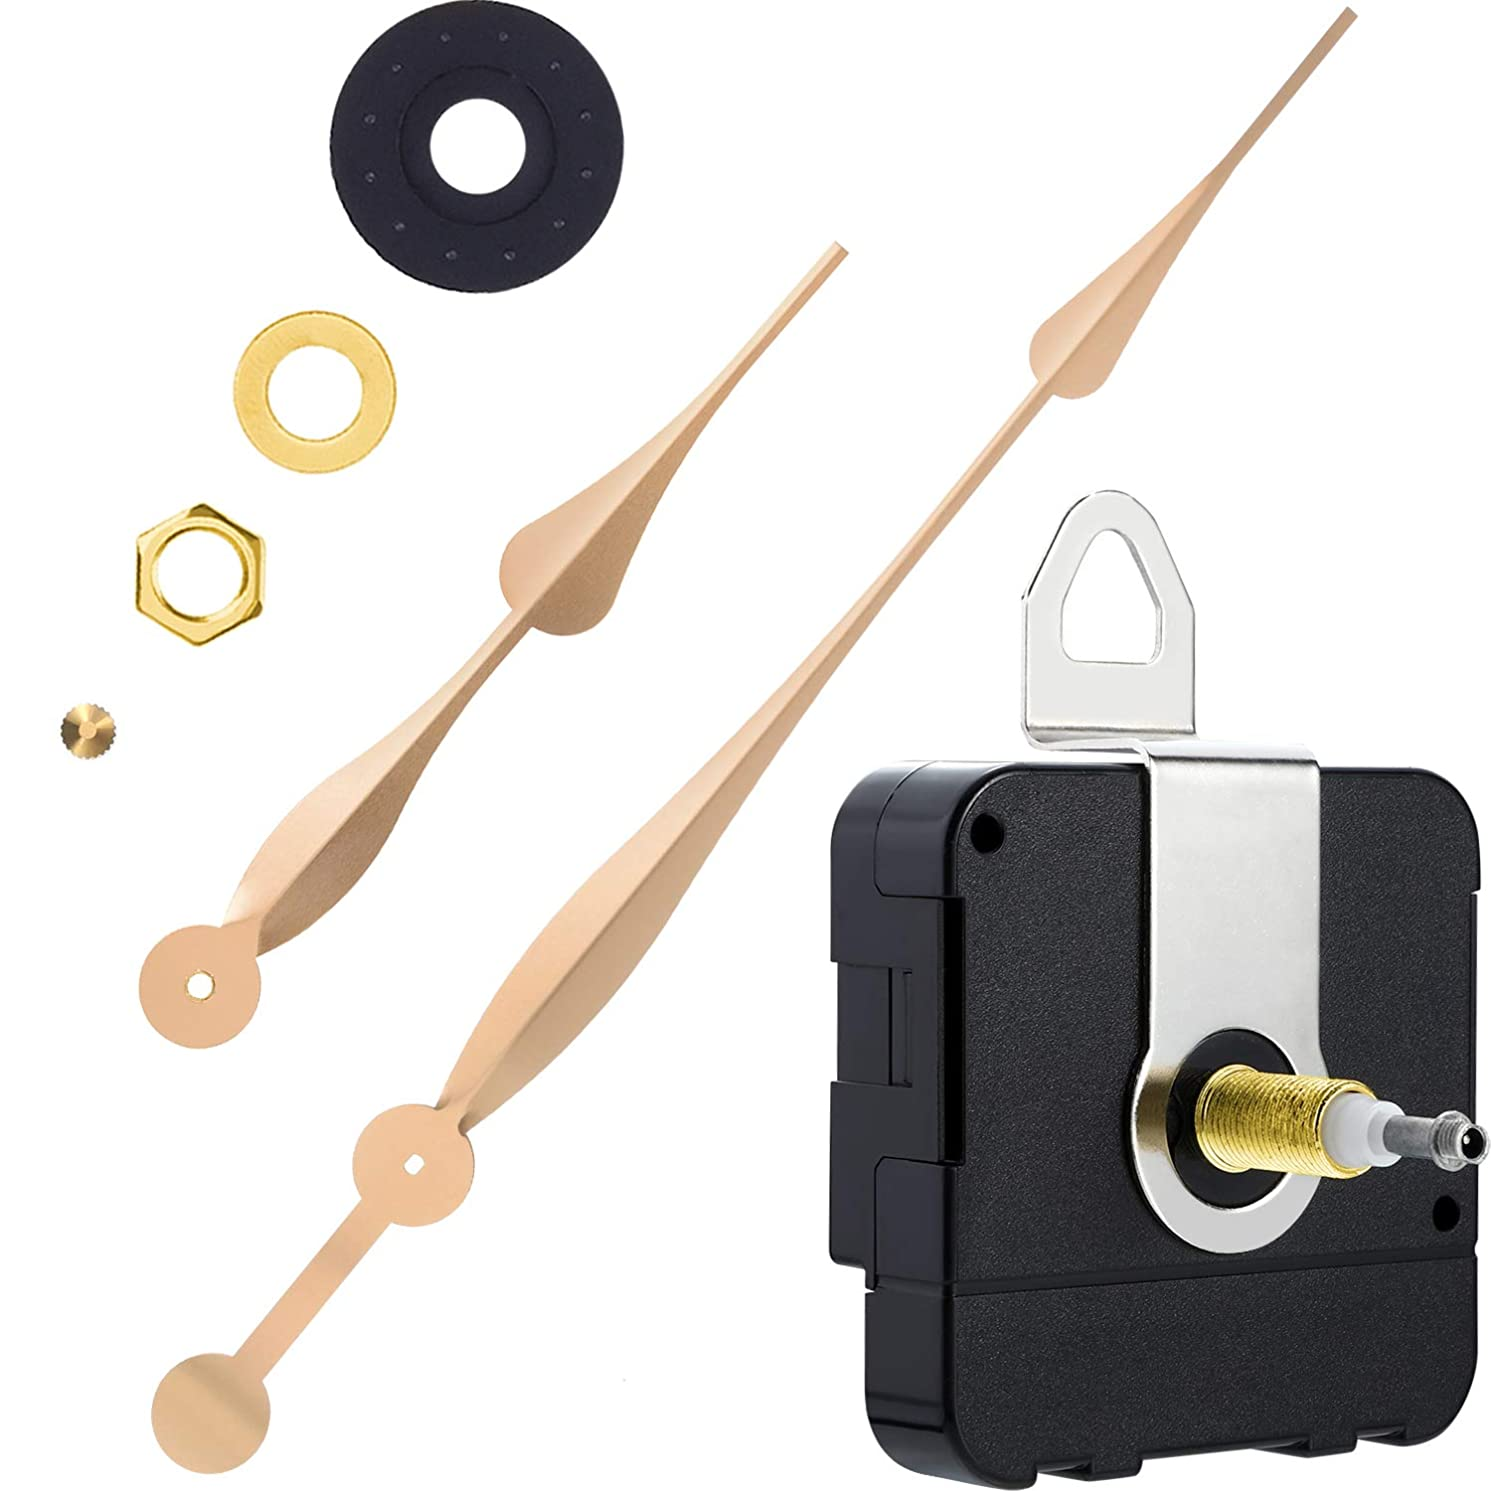 High Torque Quartz Clock Movement Clock Replacement Mechanism with 12 Inch Long Spade Hands for DIY Clock (Gold, Shaft Length 1-1/5 inches/ 31 mm Shaft Length)